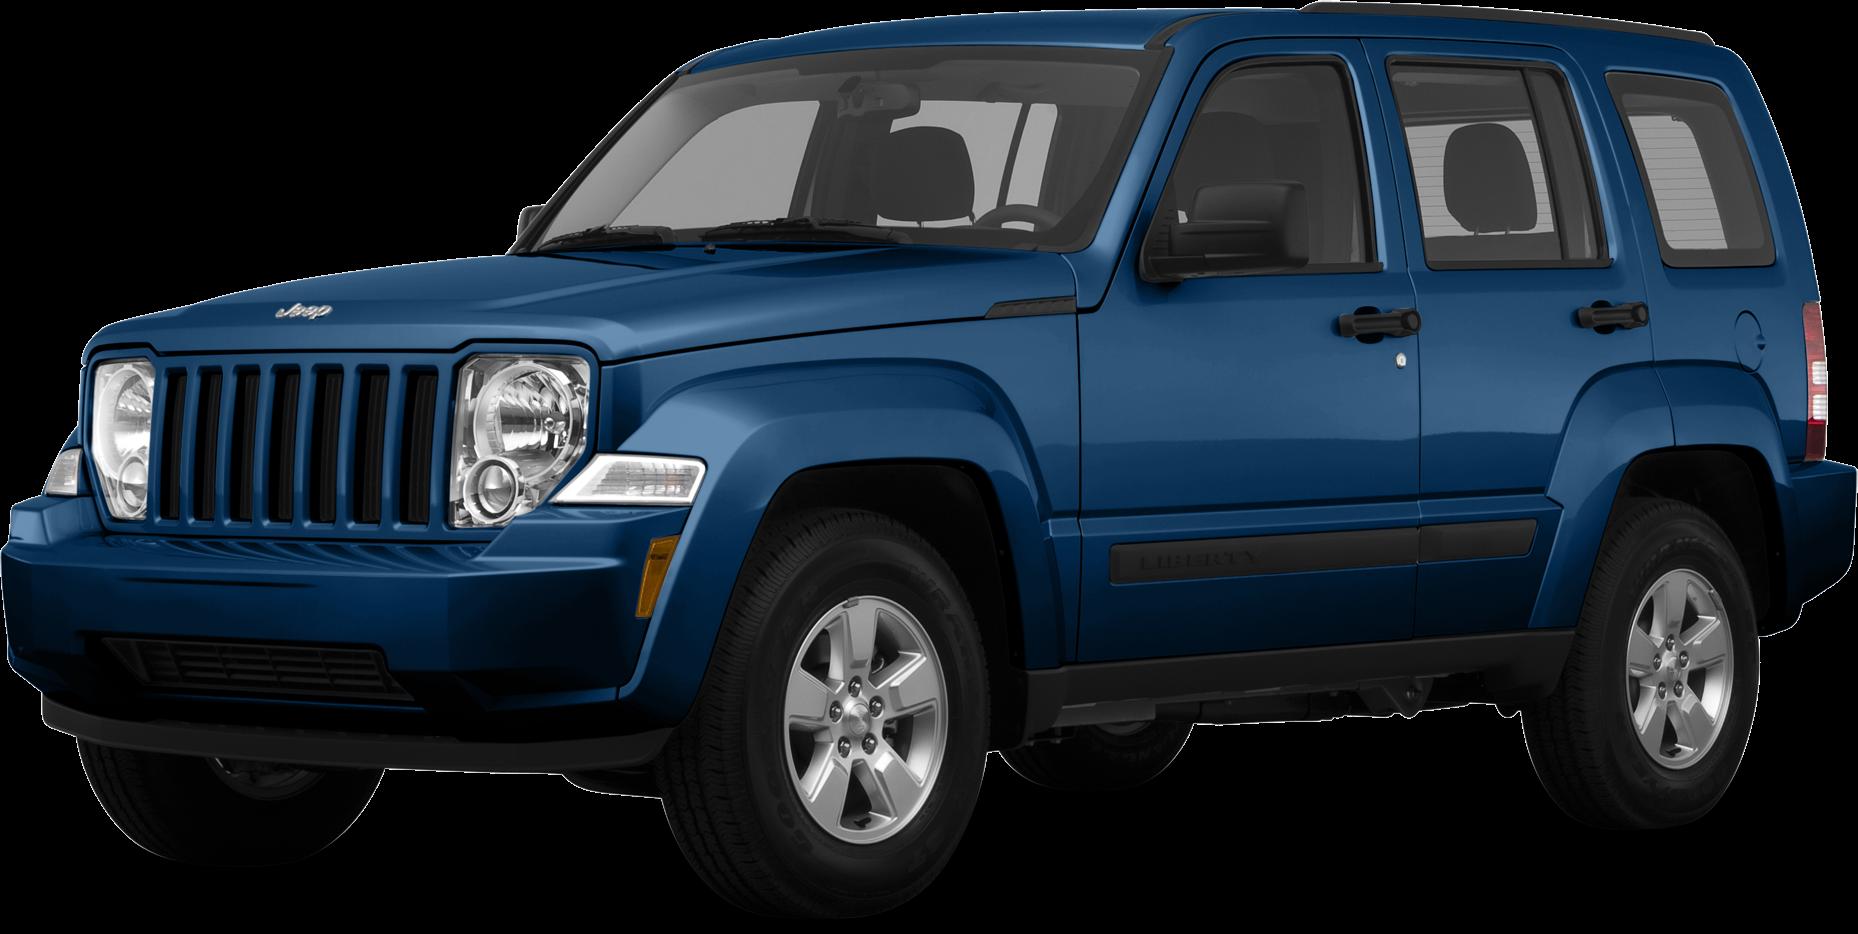 2012 Jeep Liberty Sport Blue